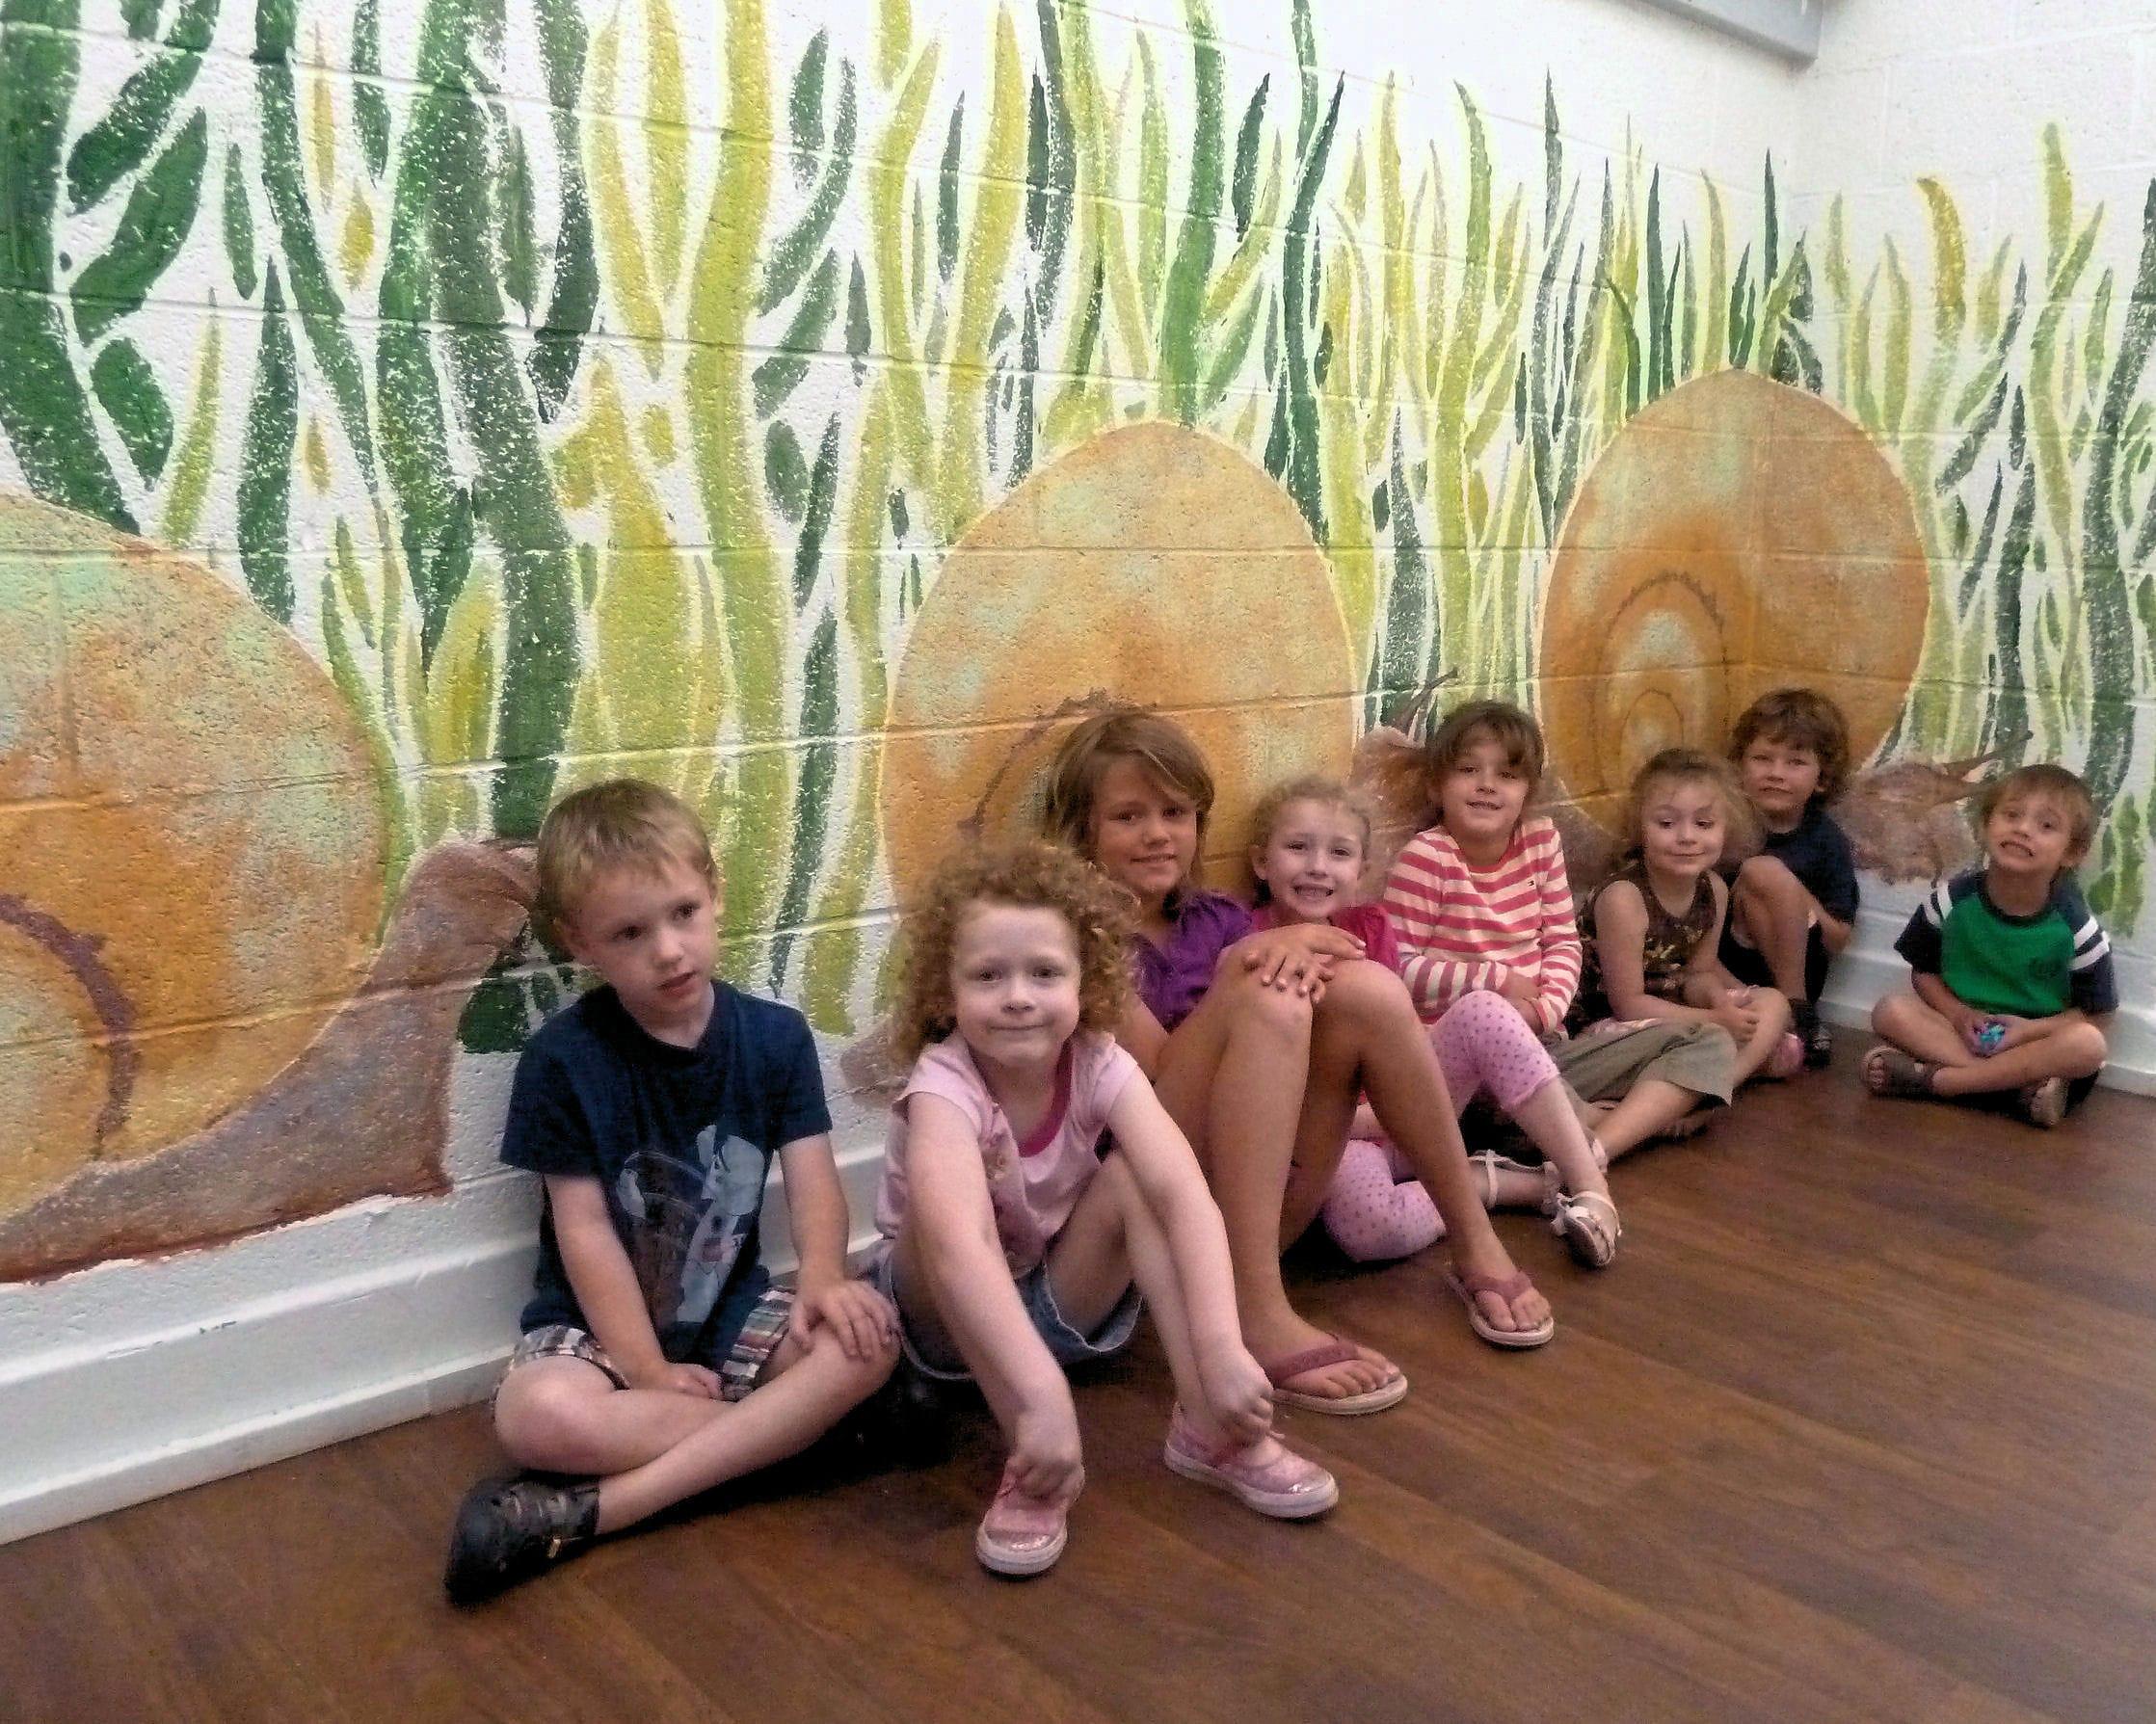 Snail Mural Painters to print SJECC Aug 2011 (1)-min